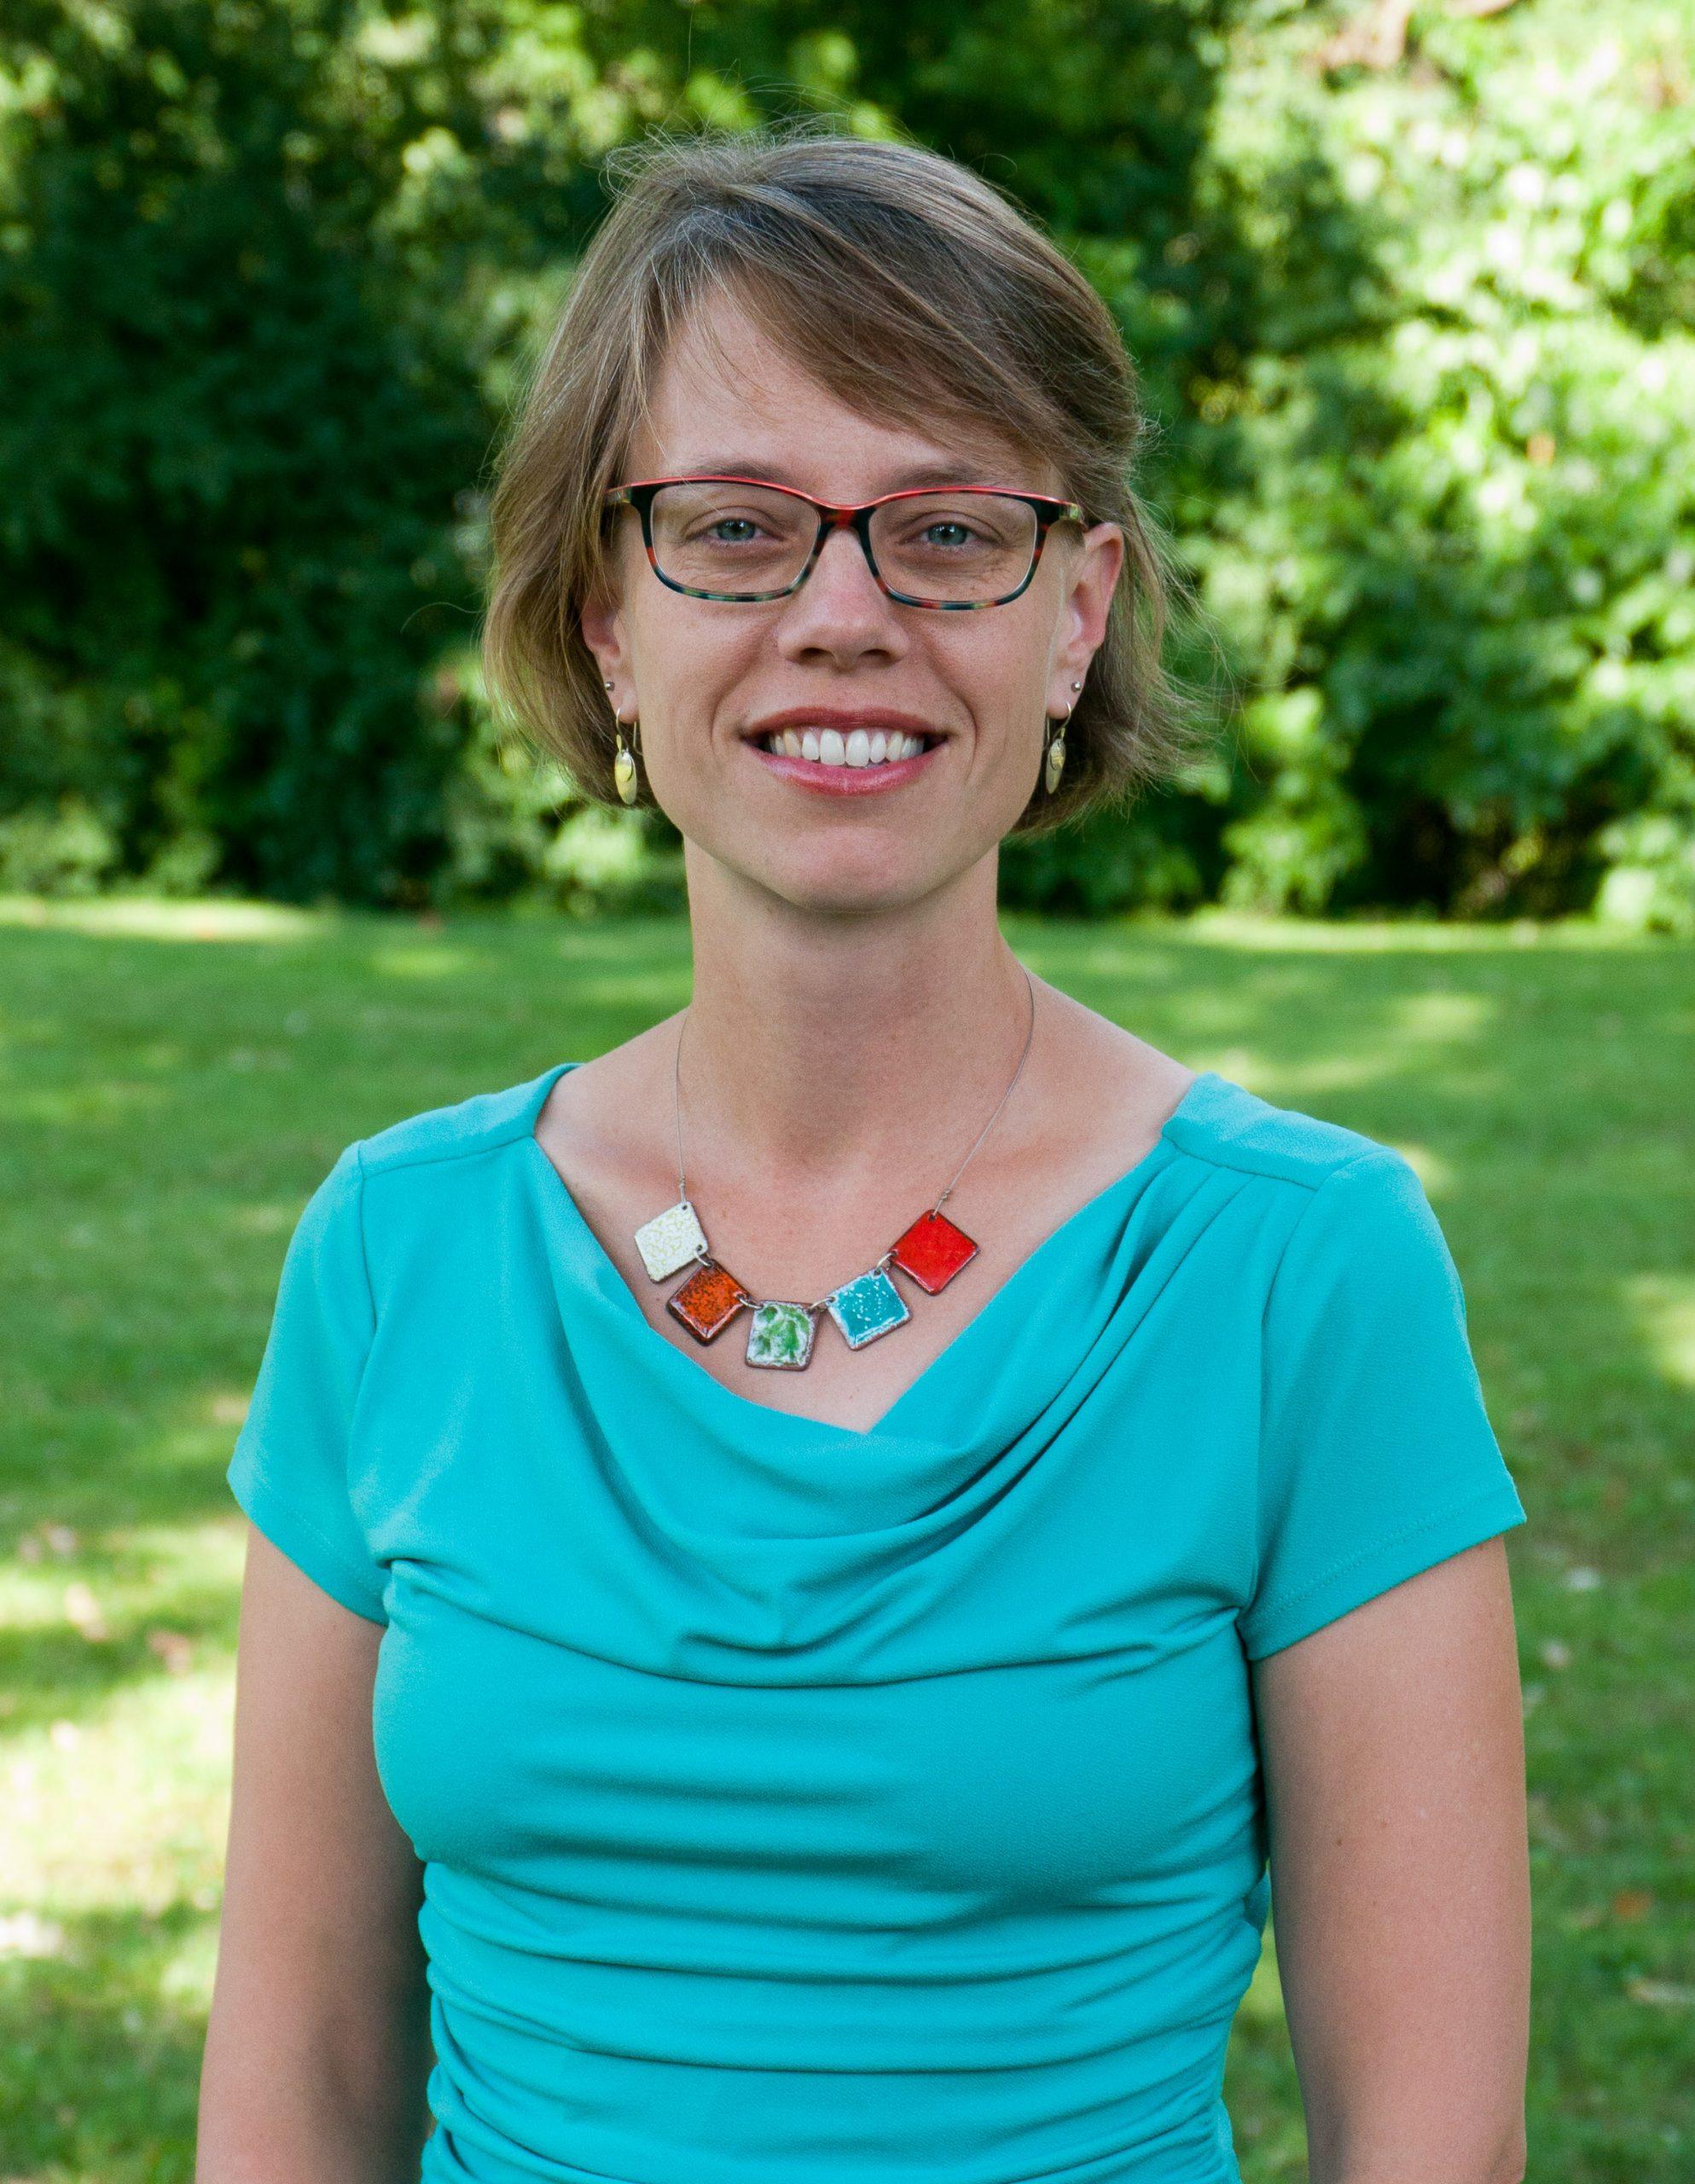 Sarah Hinlicky Wilson